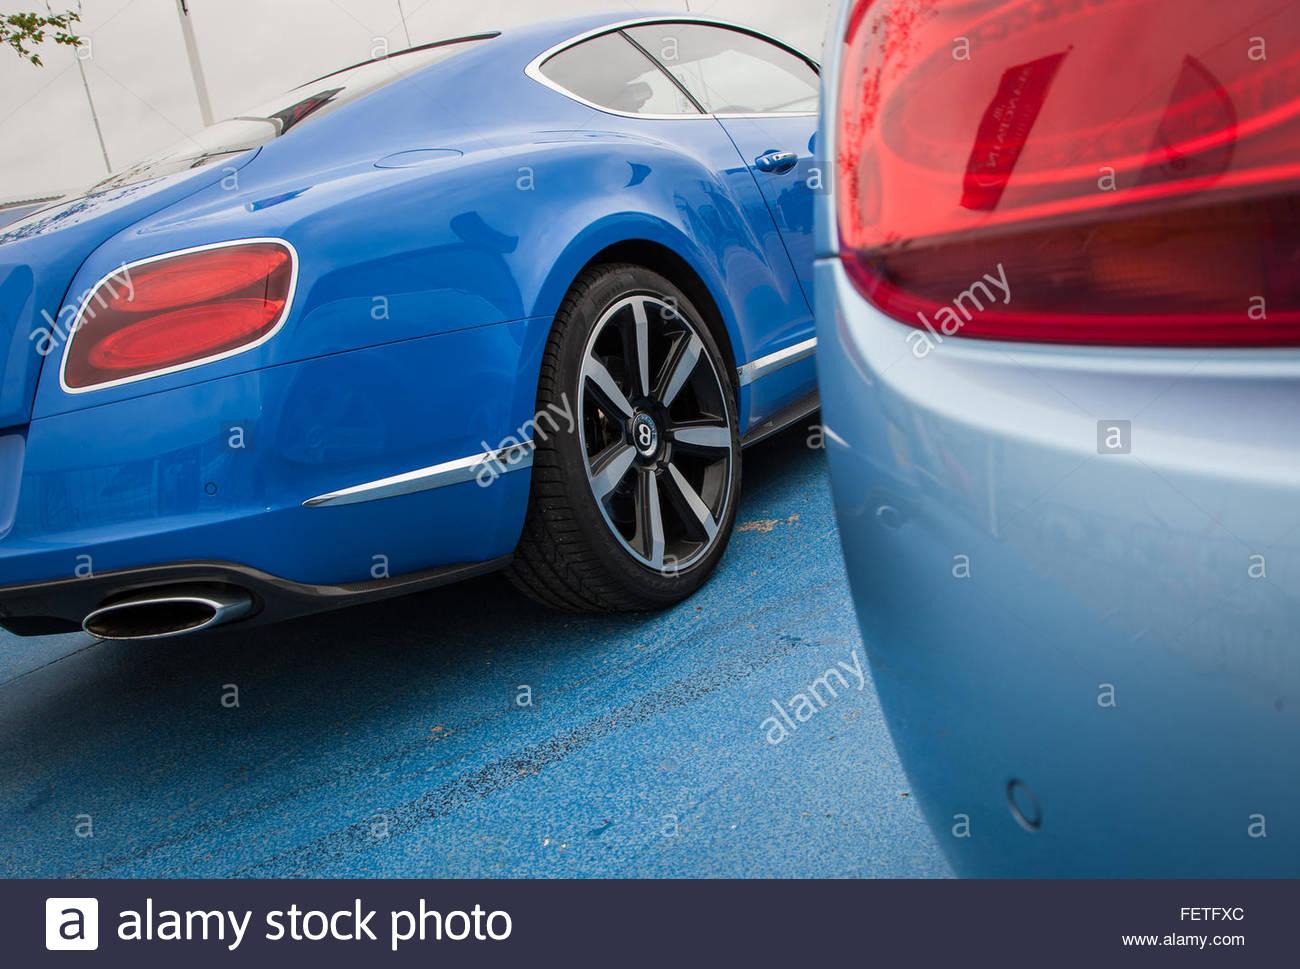 Car Tail Lights - Stock Image